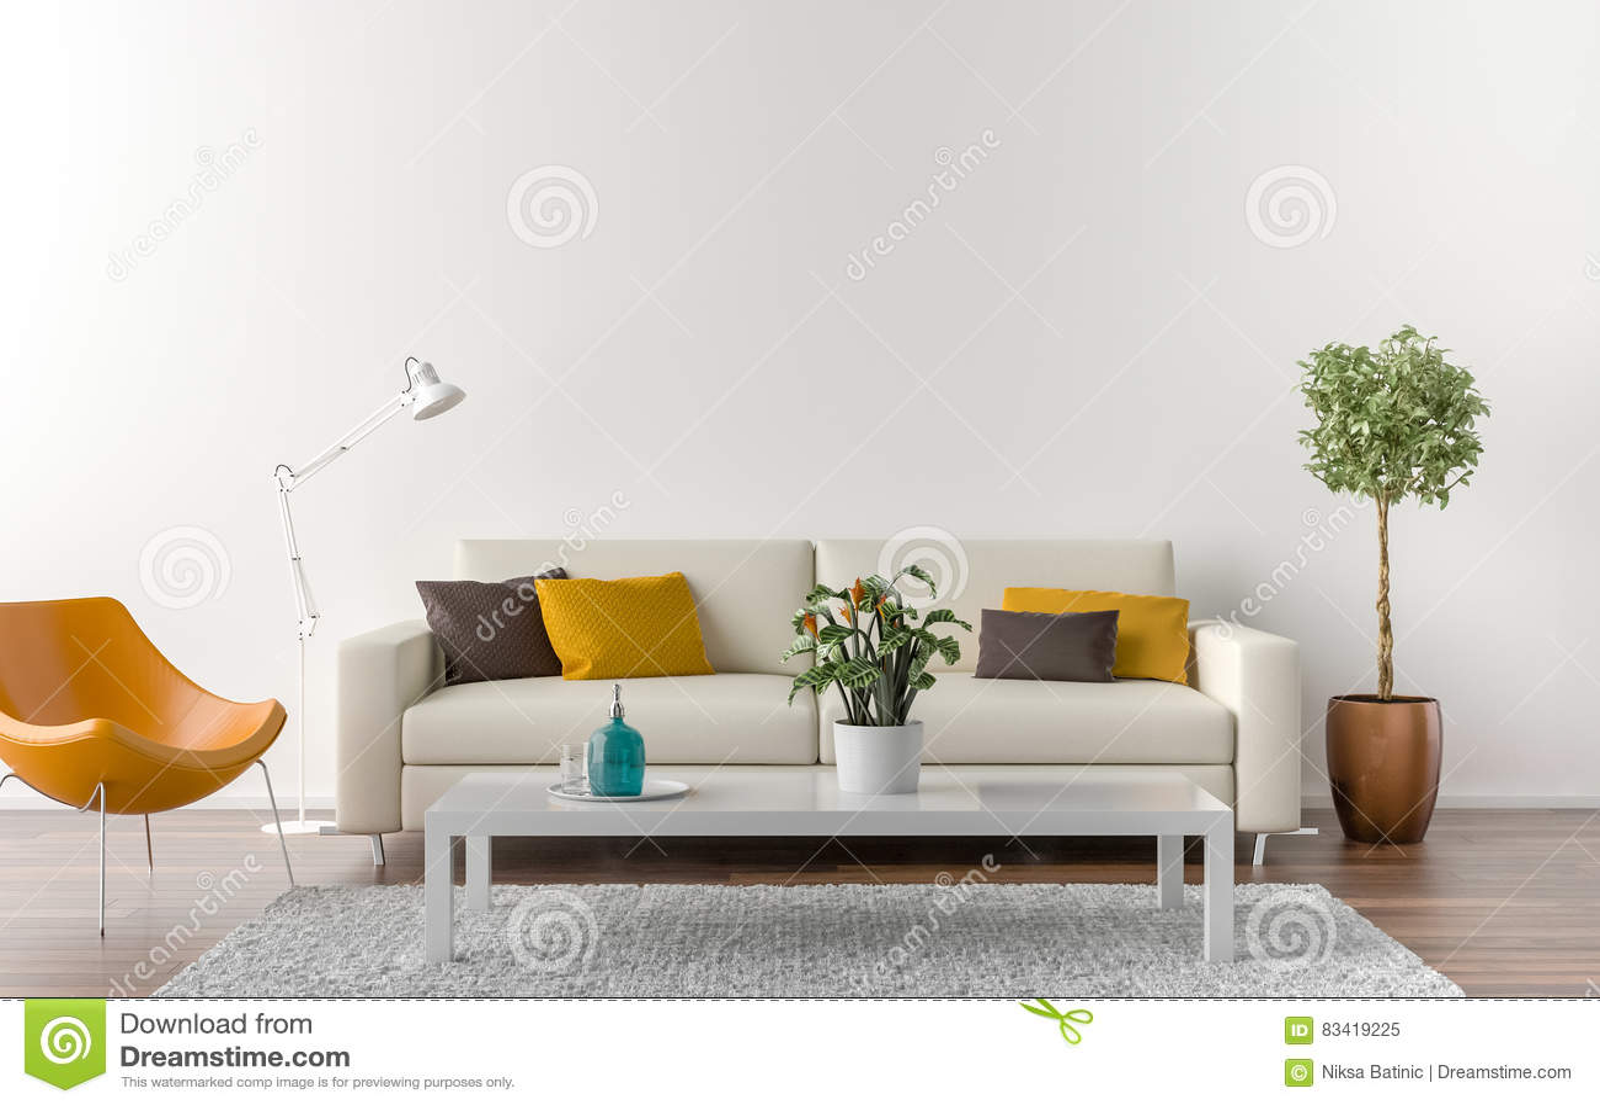 salon vide avec le mur blanc l 39 arri re plan illustration stock image 83419225. Black Bedroom Furniture Sets. Home Design Ideas